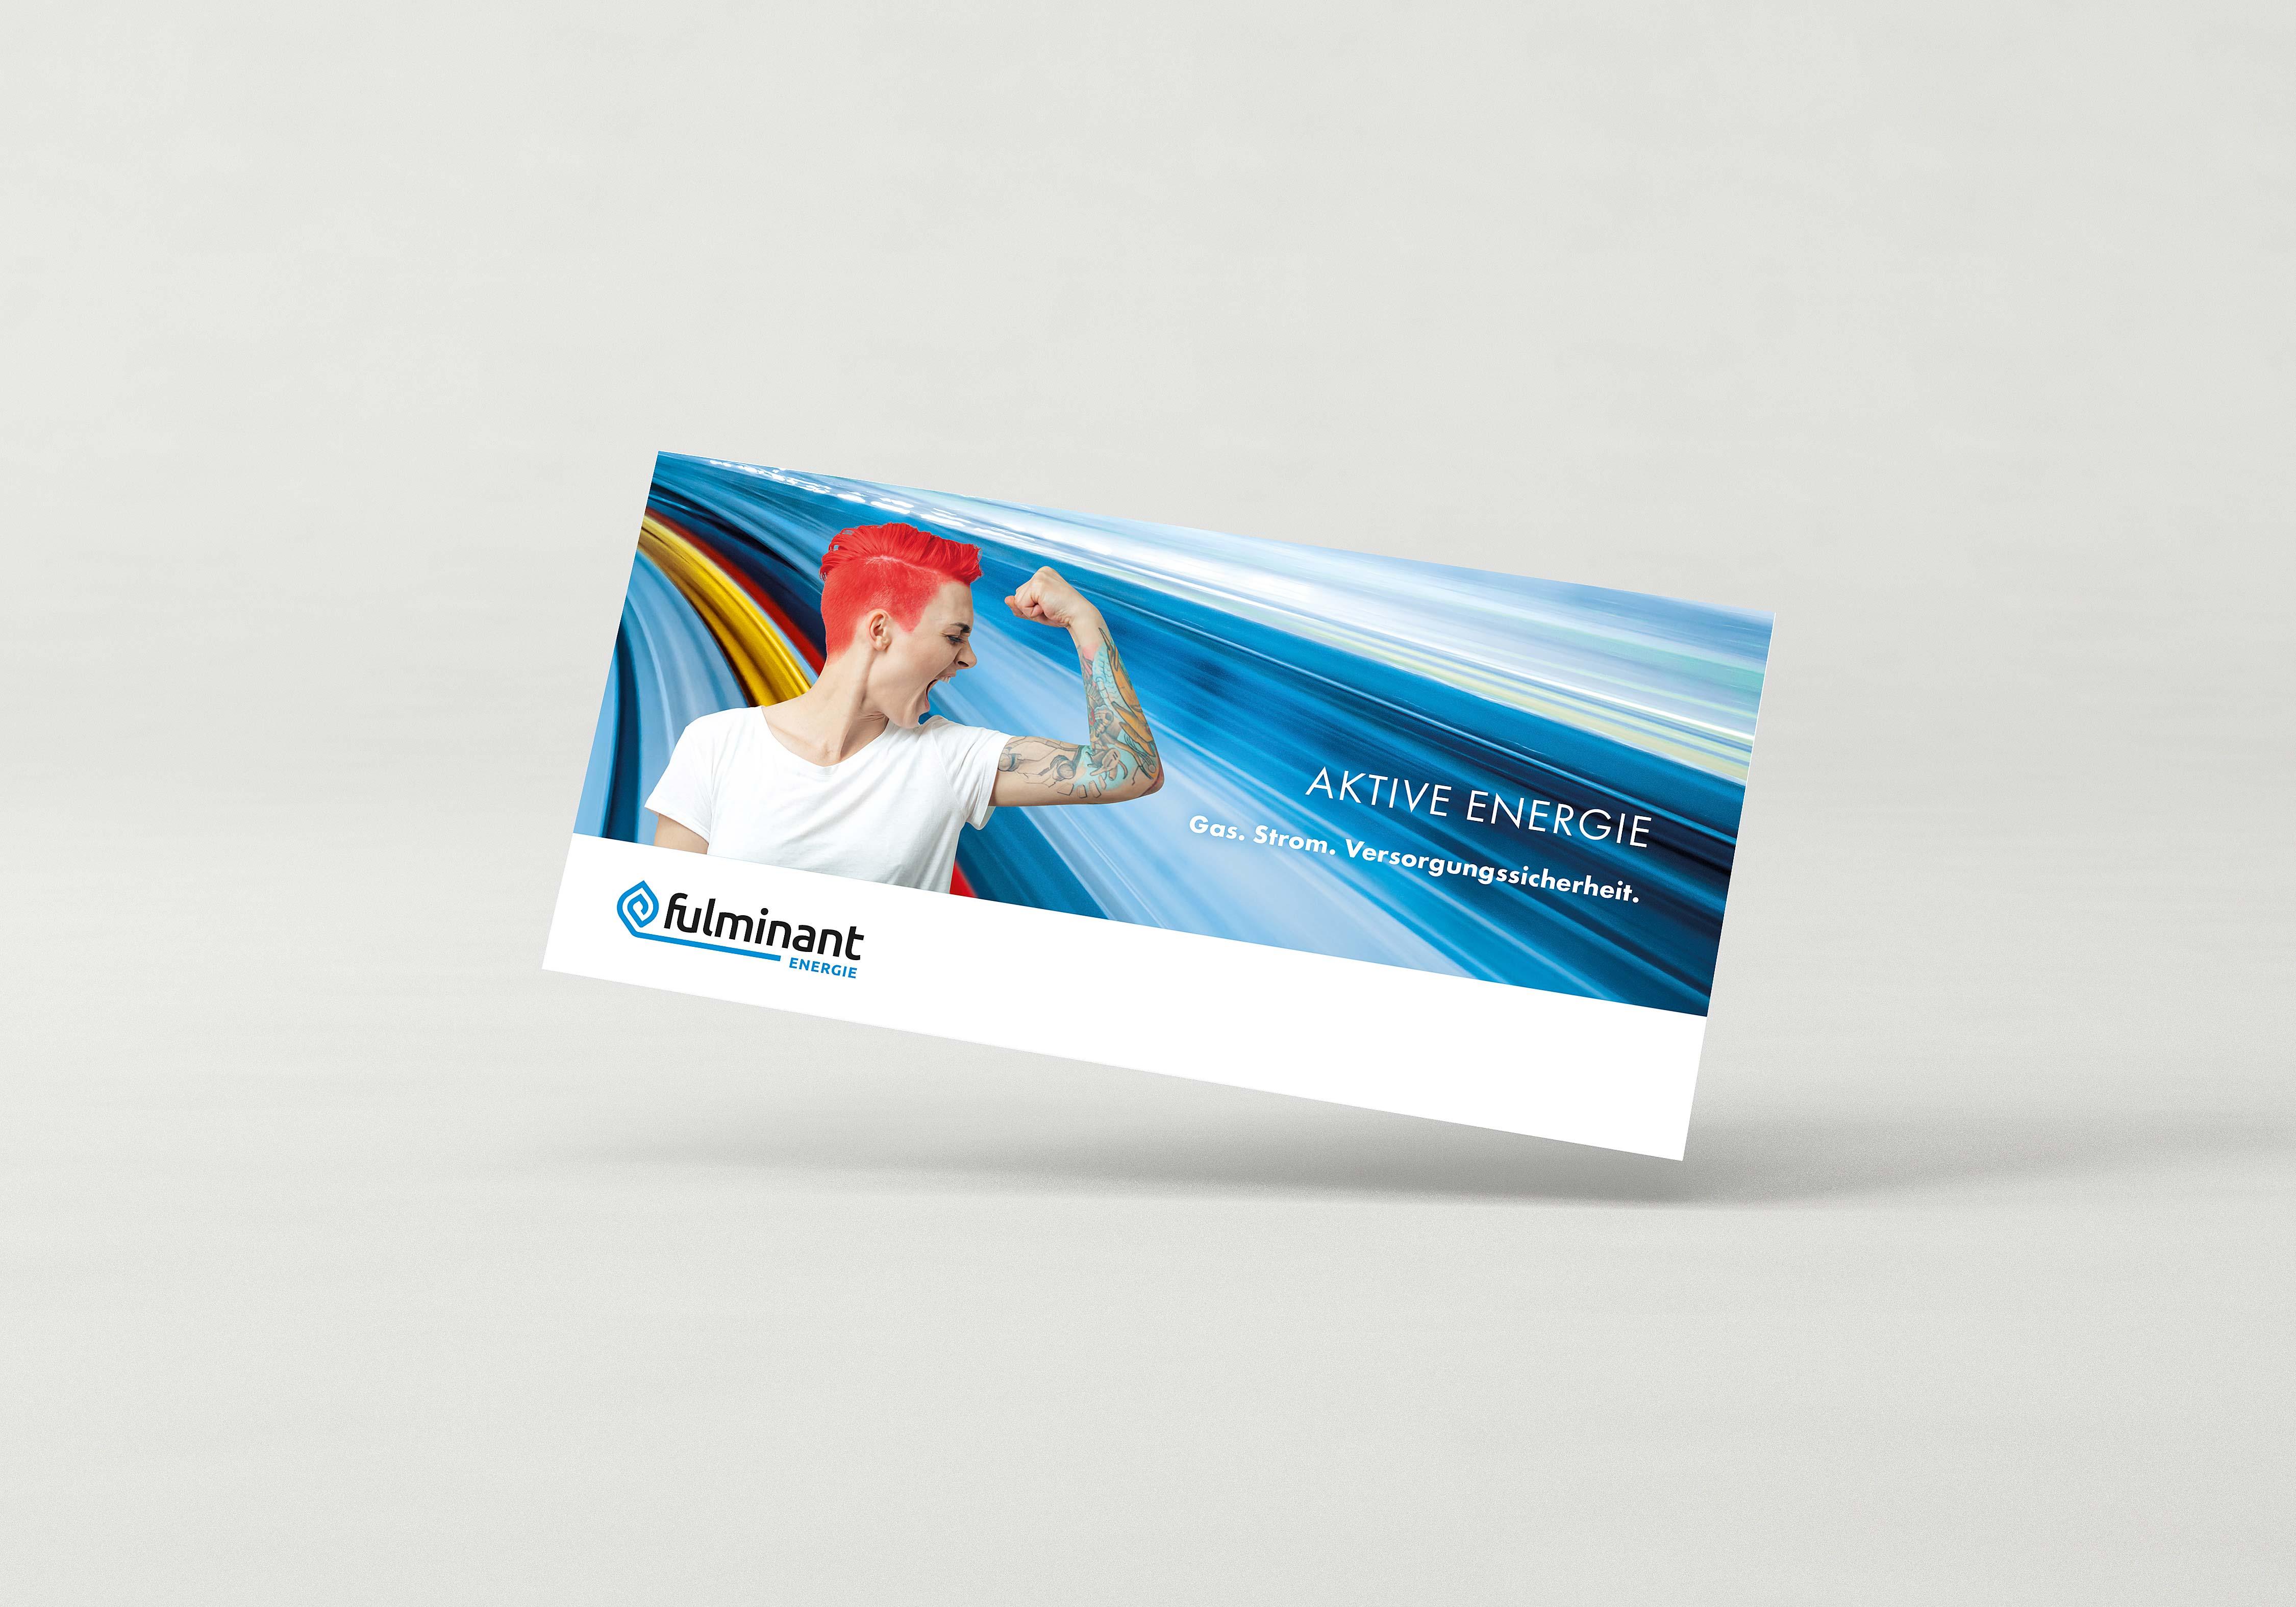 Fulminant Energie GmbH